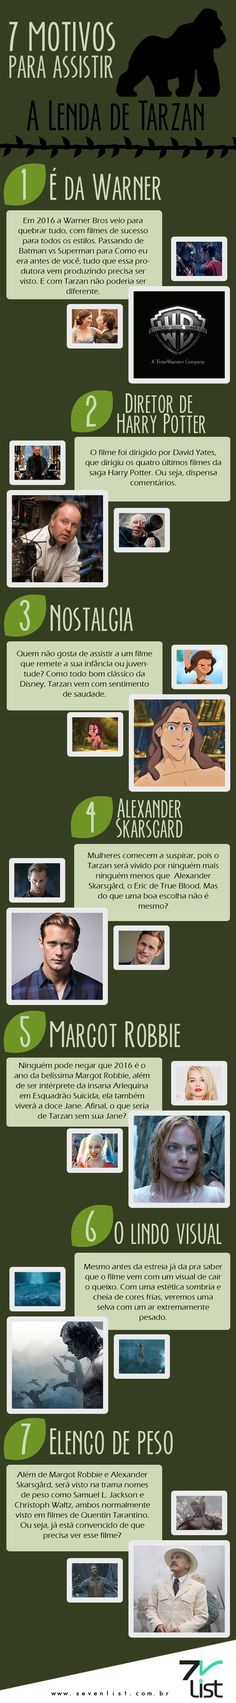 #Infográfico #Design #Tarzan #Disney #Warner #TrueBlood #AlexanderSkarsgård #MargotRobbie #Cinema #Filme #Entretenimento